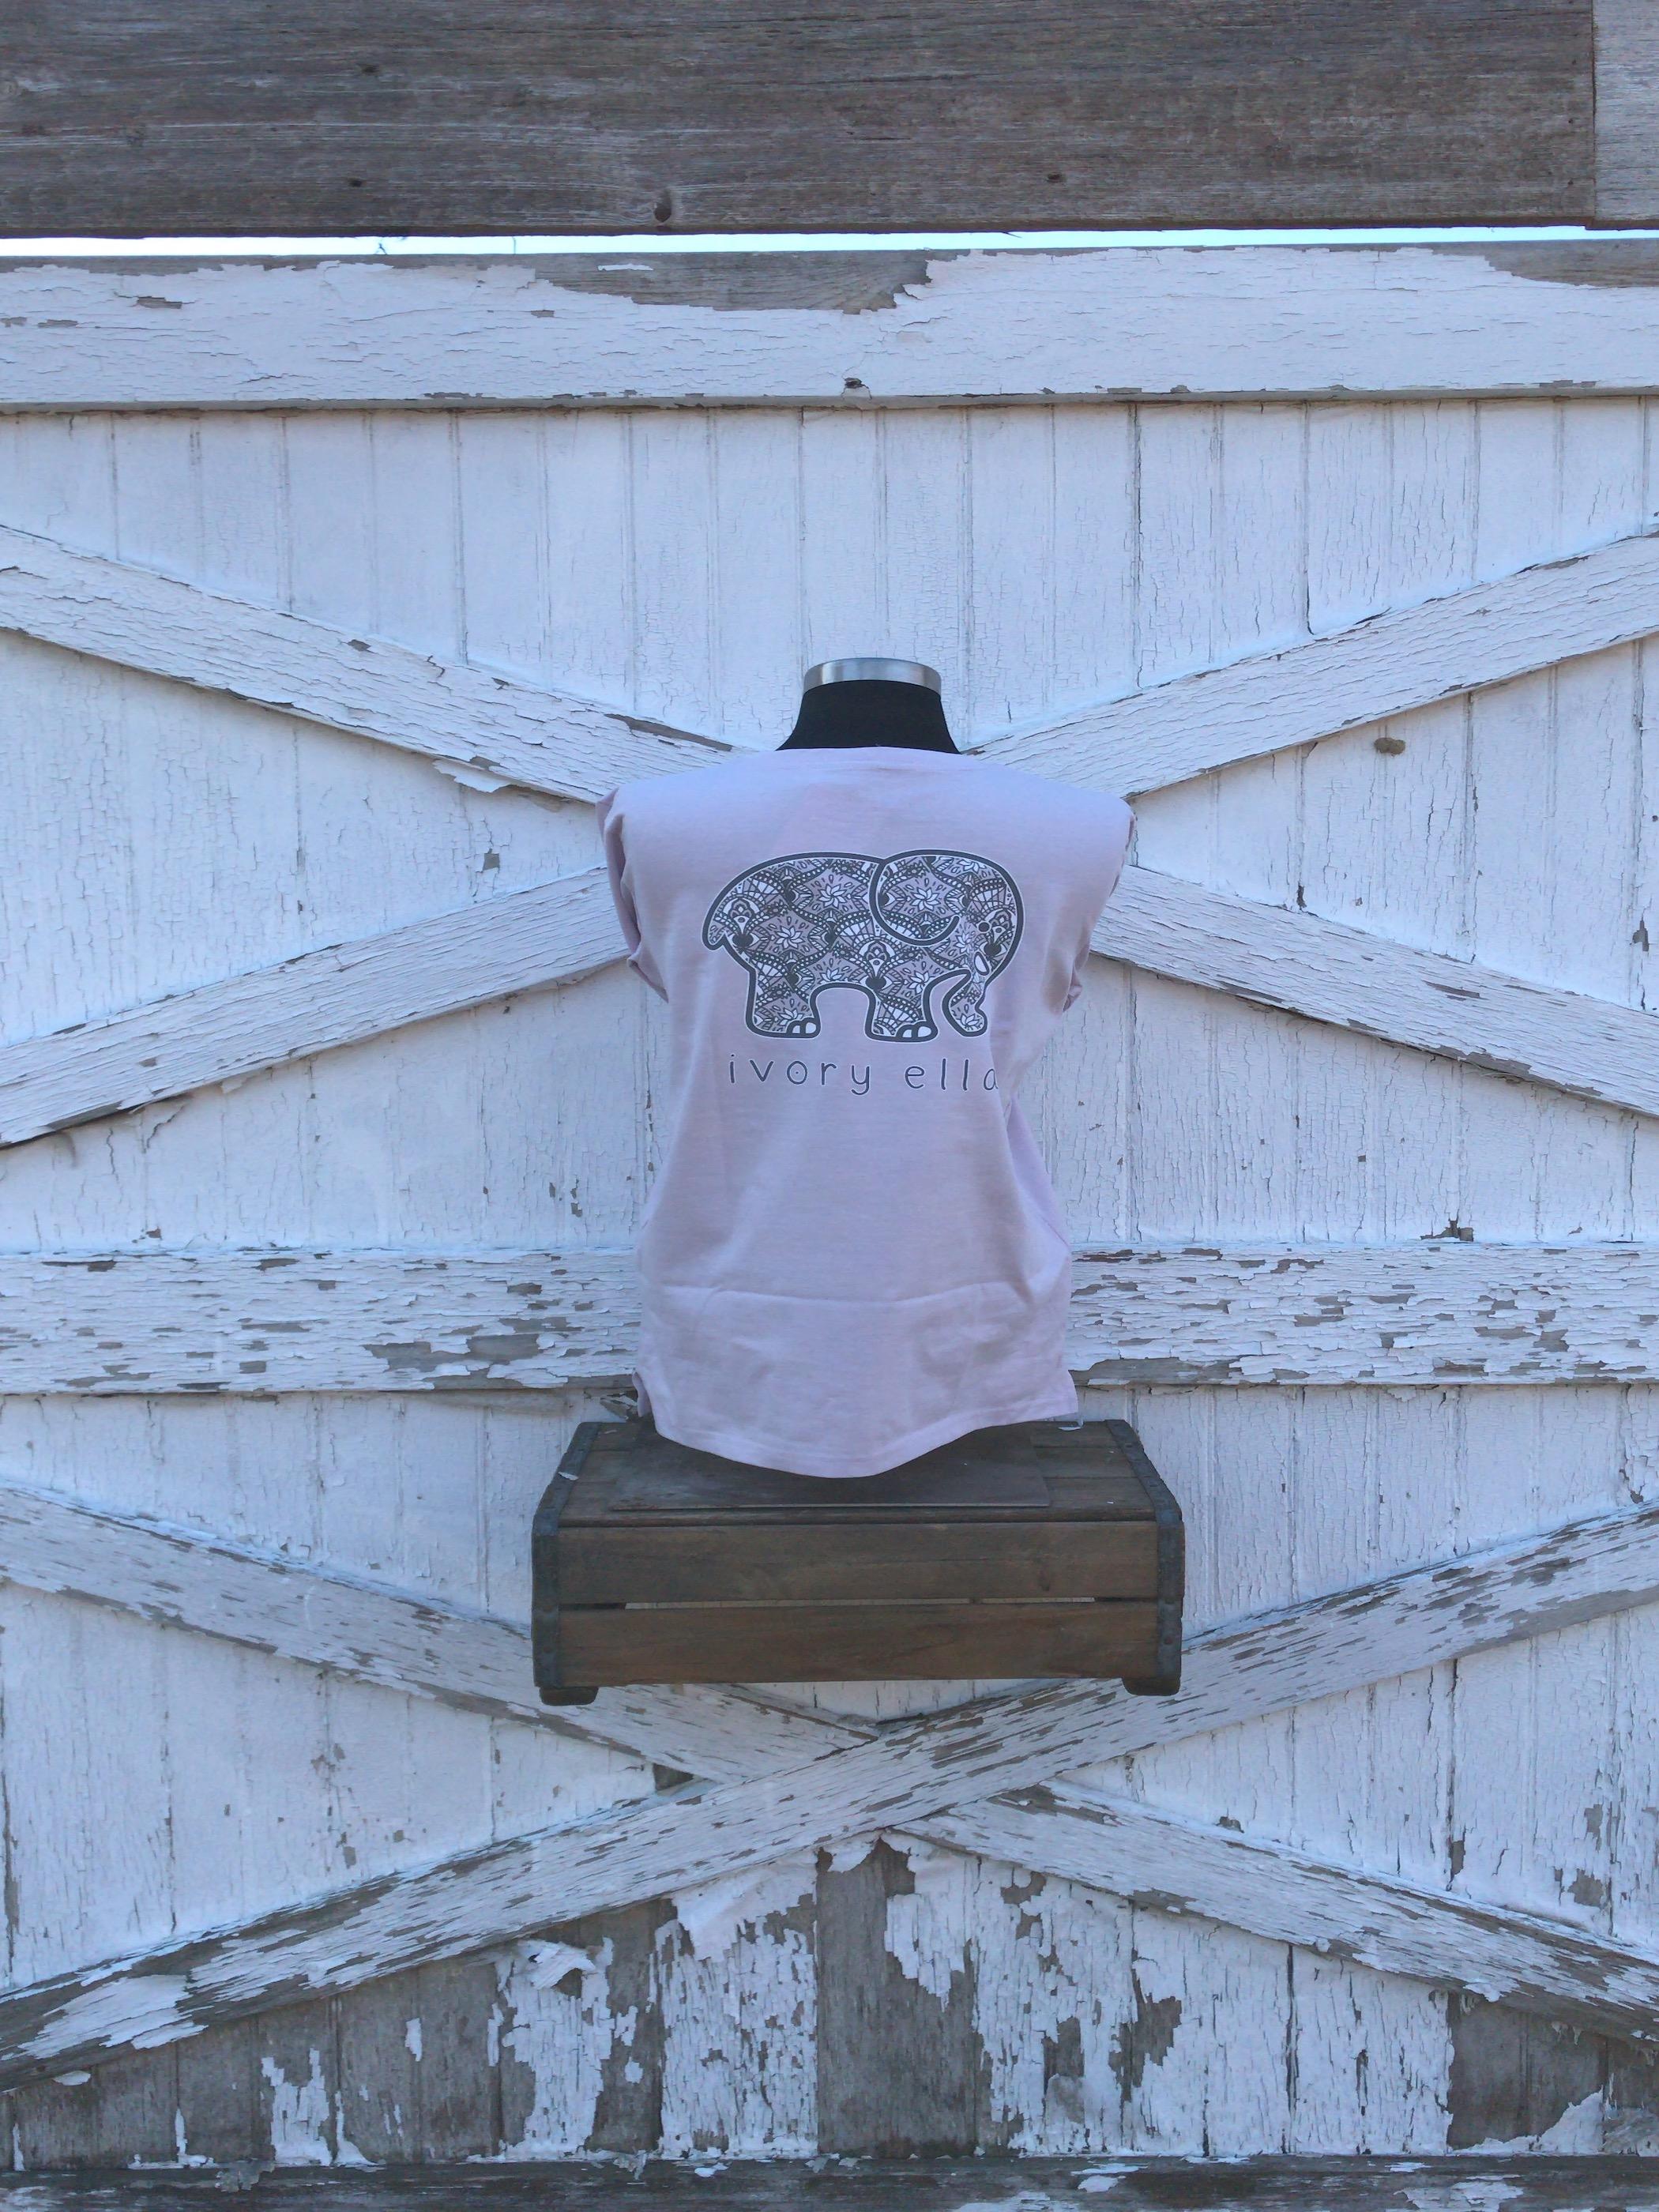 6c215d2d1 Ivory Ella Womens Long Sleeve T-Shirt – Amethyst – Winterwood Gift ...